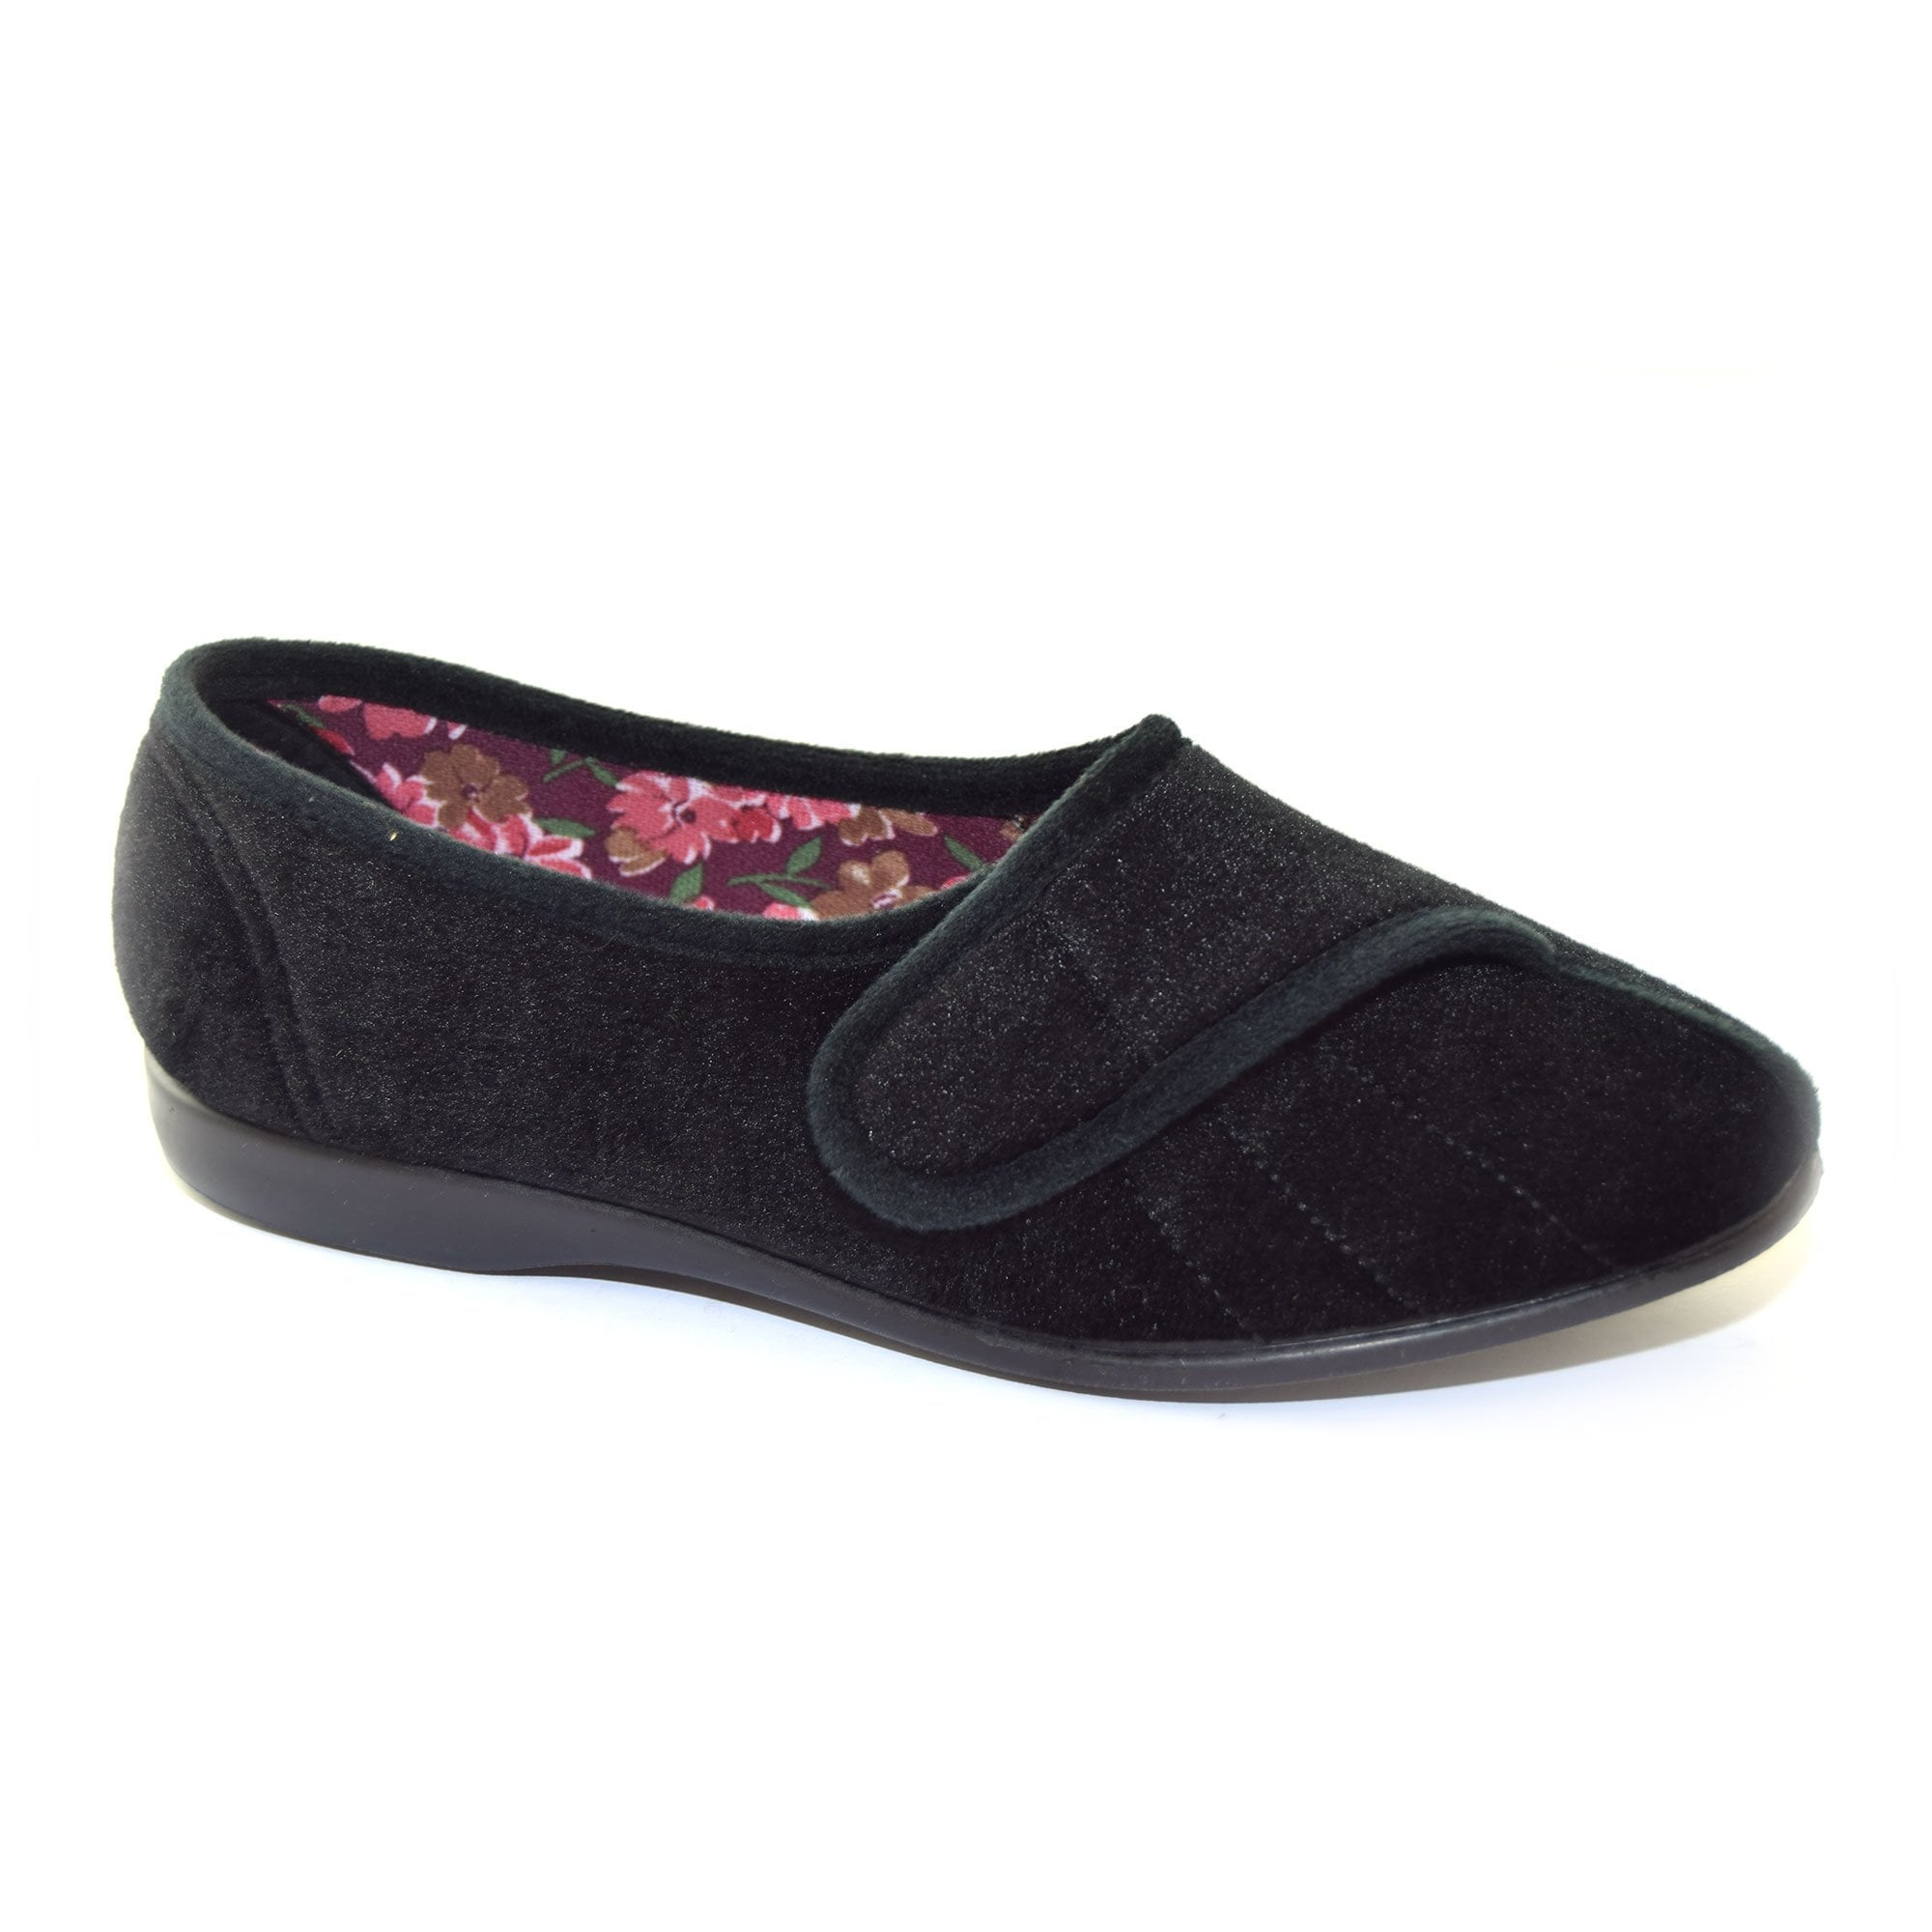 GBS Audrey Slipper Black Classic Ladies Slippers Textile